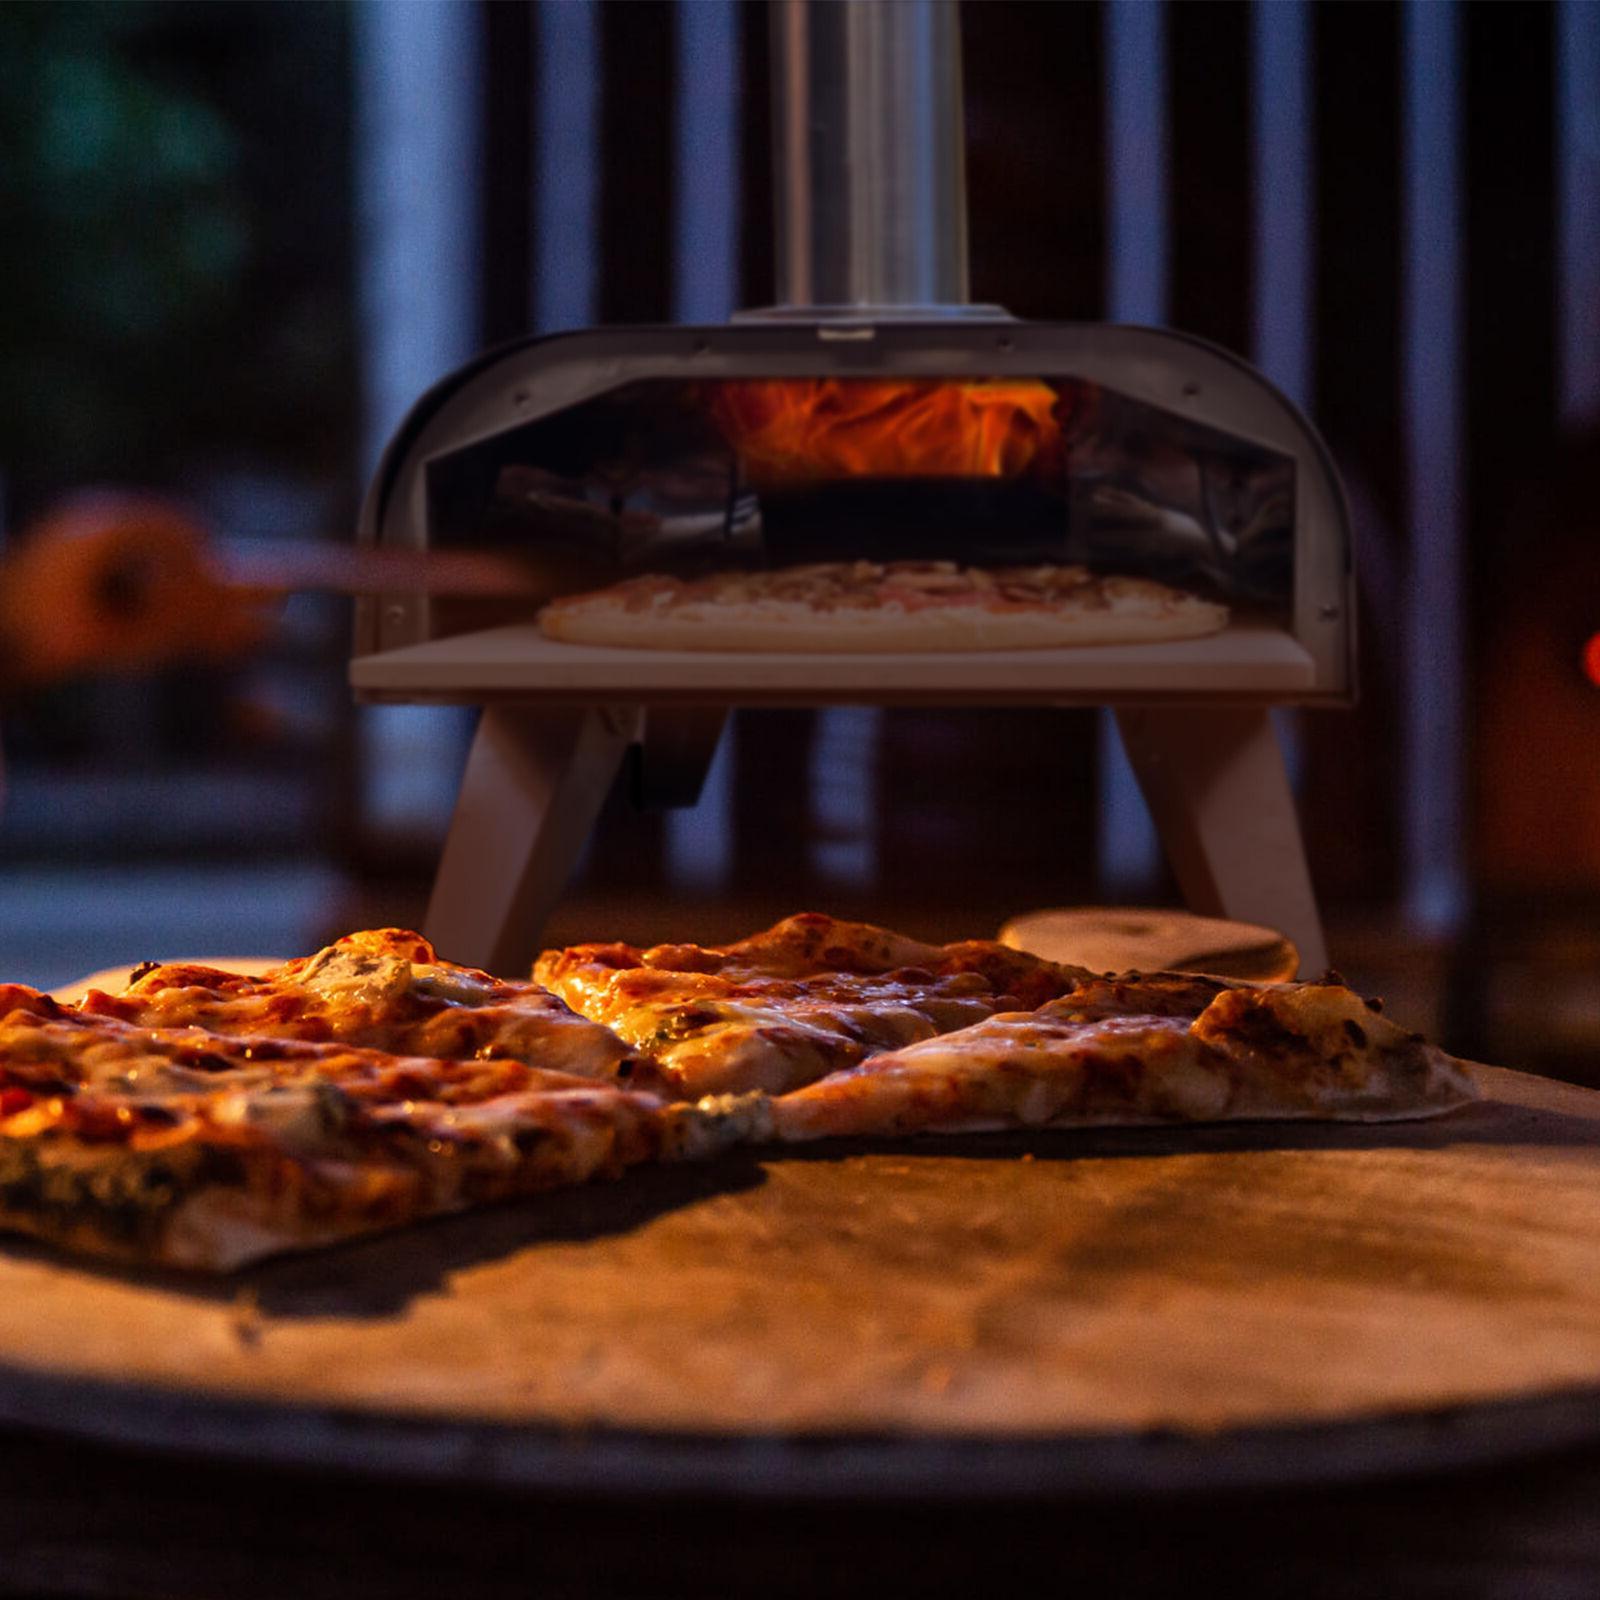 Big Portable Pizza Oven Grill Wood Smoker Food Grade